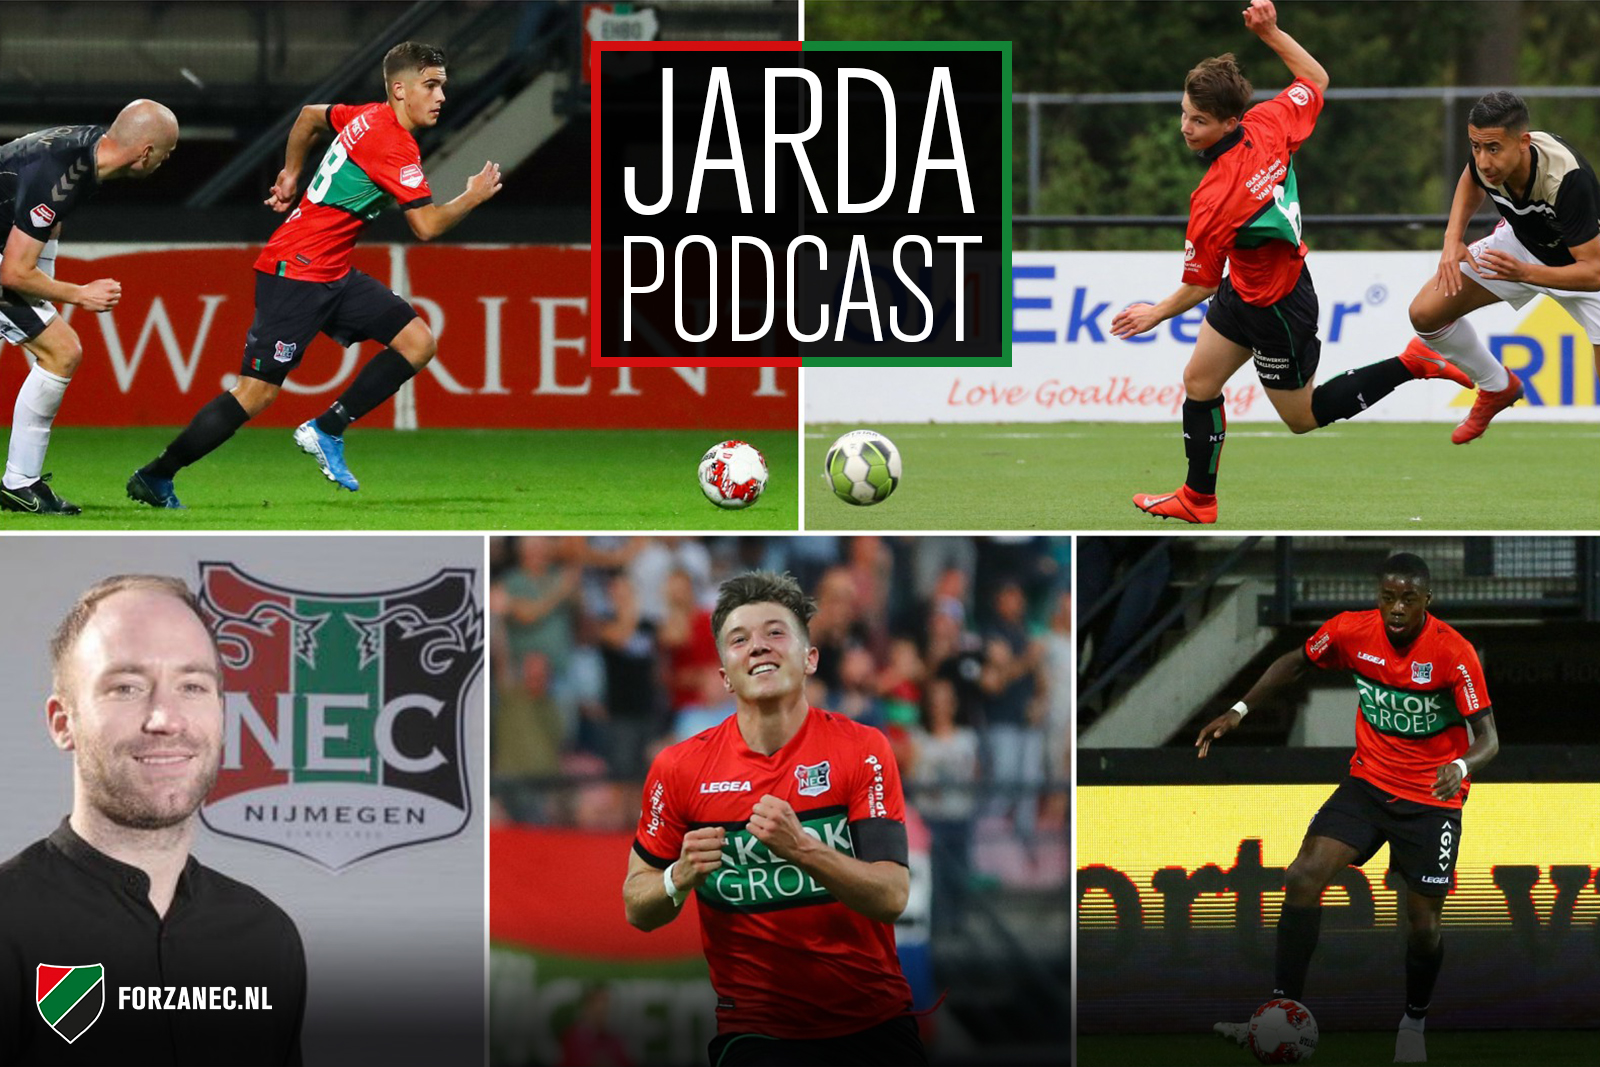 Jarda Podcast Special: Dominique Scholten over de jeugdopleiding van NEC